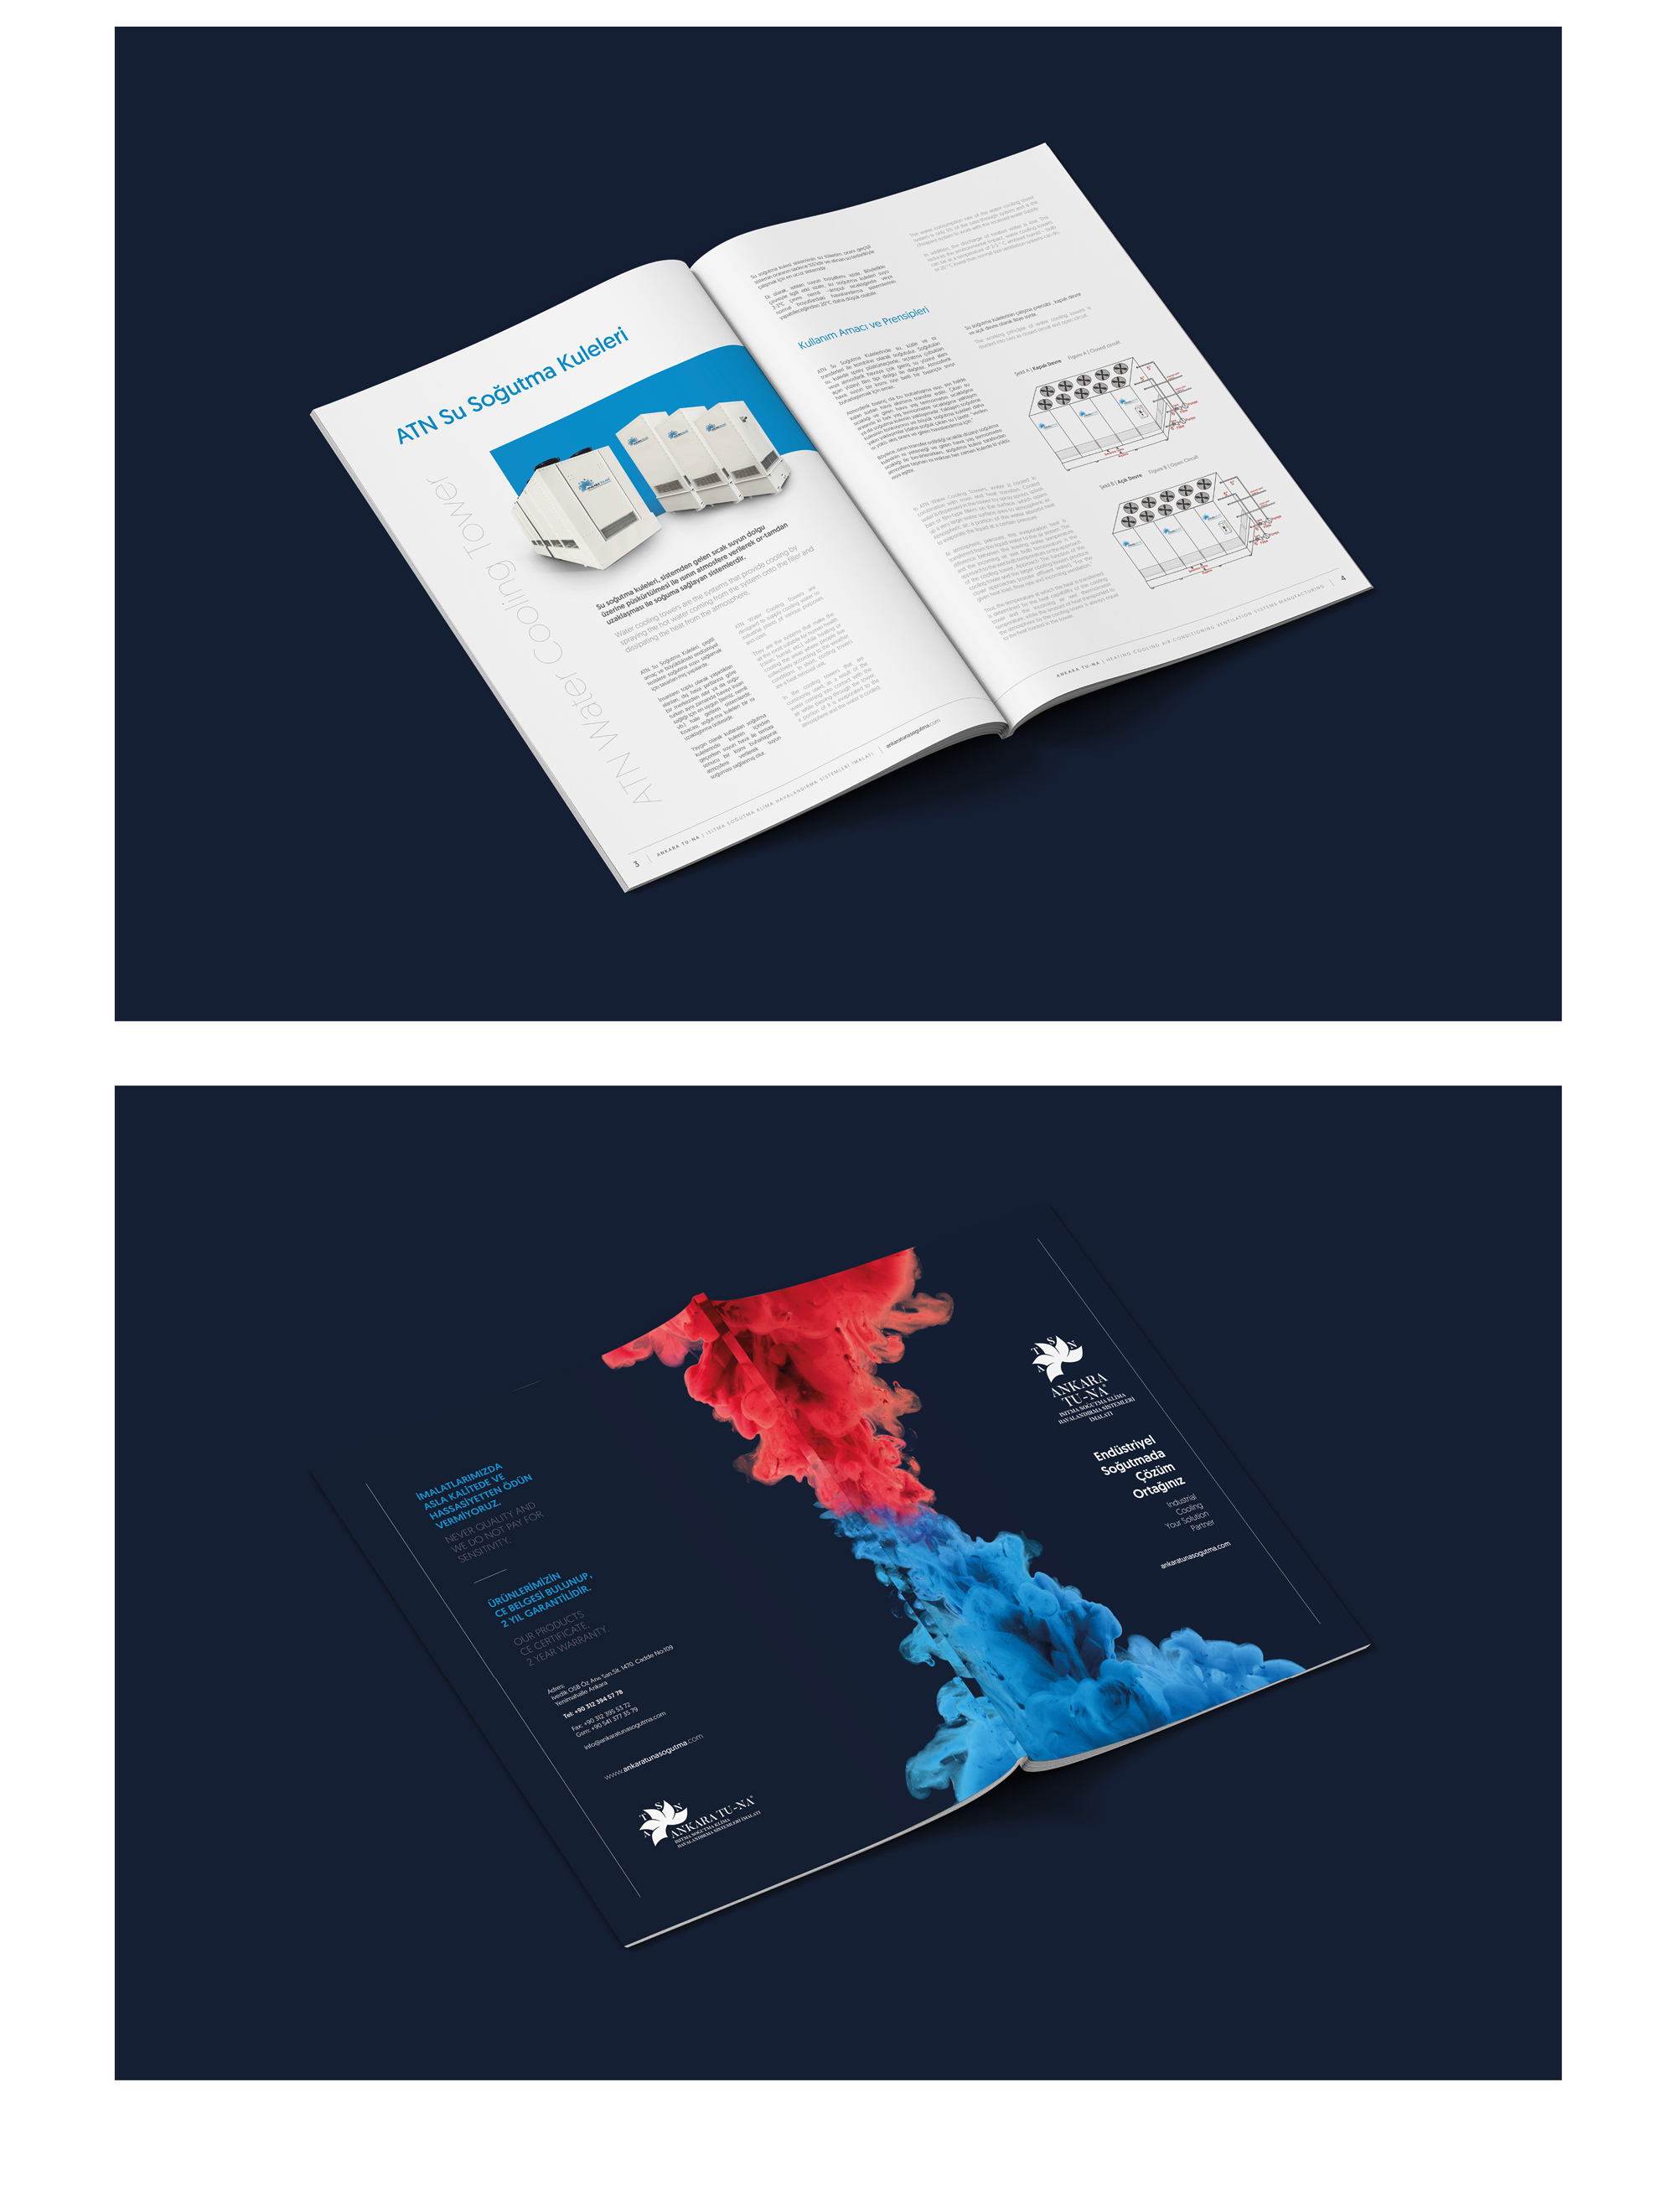 Ankara kurumsal kimlik tasarımı  Ankara Tuna Soğutma